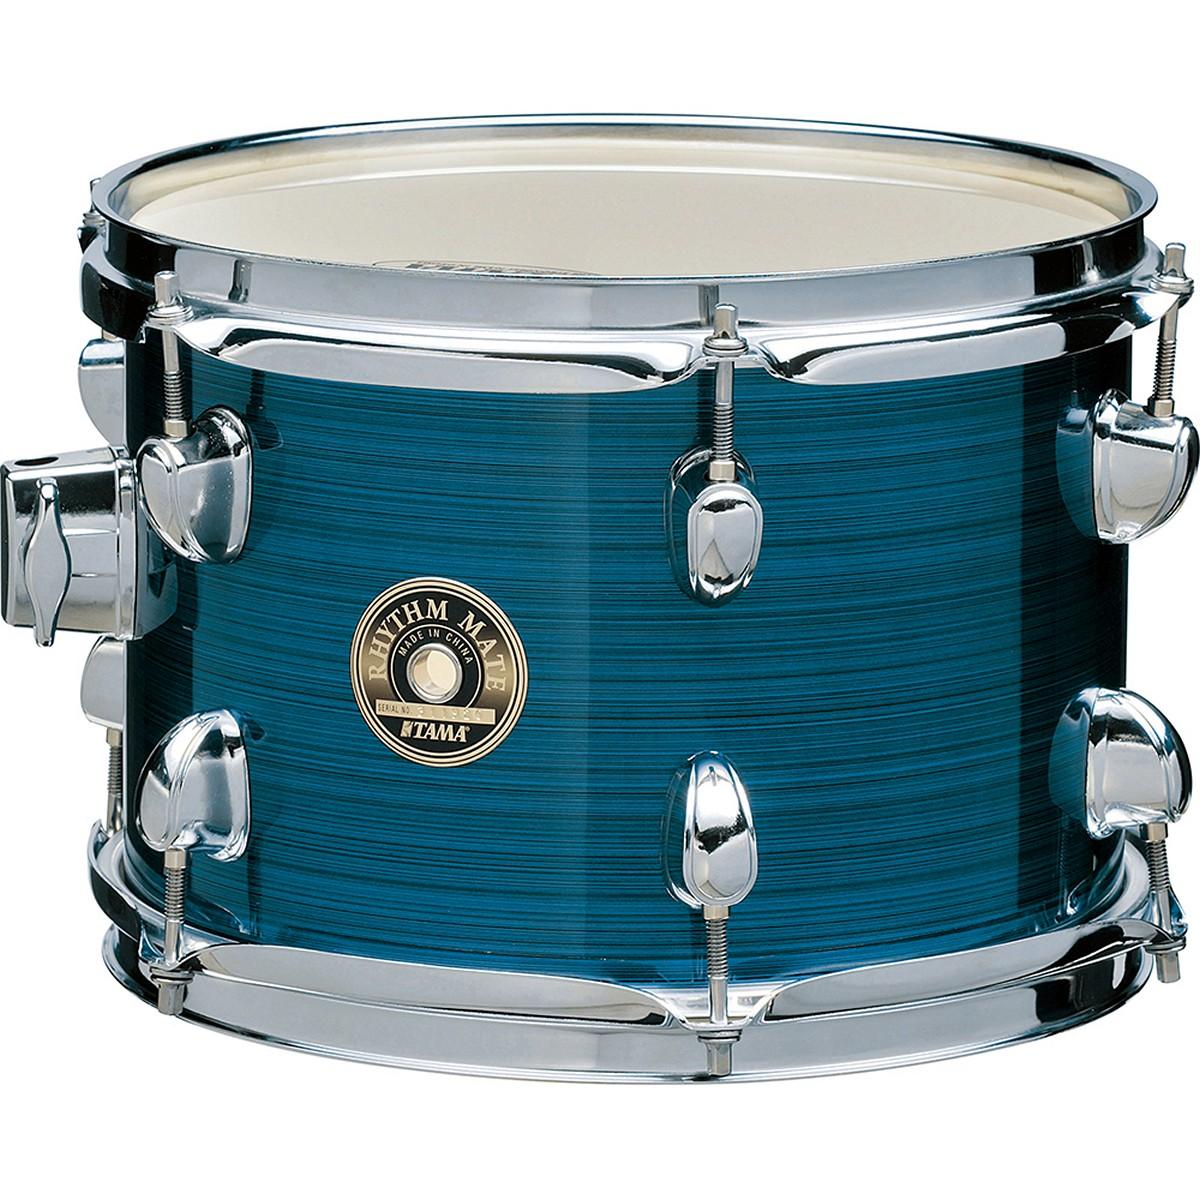 TAMA RM52KH6C-HLB - BATTERIA COMPLETA + PIATTI - FINITURA HAIRLINE BLUE